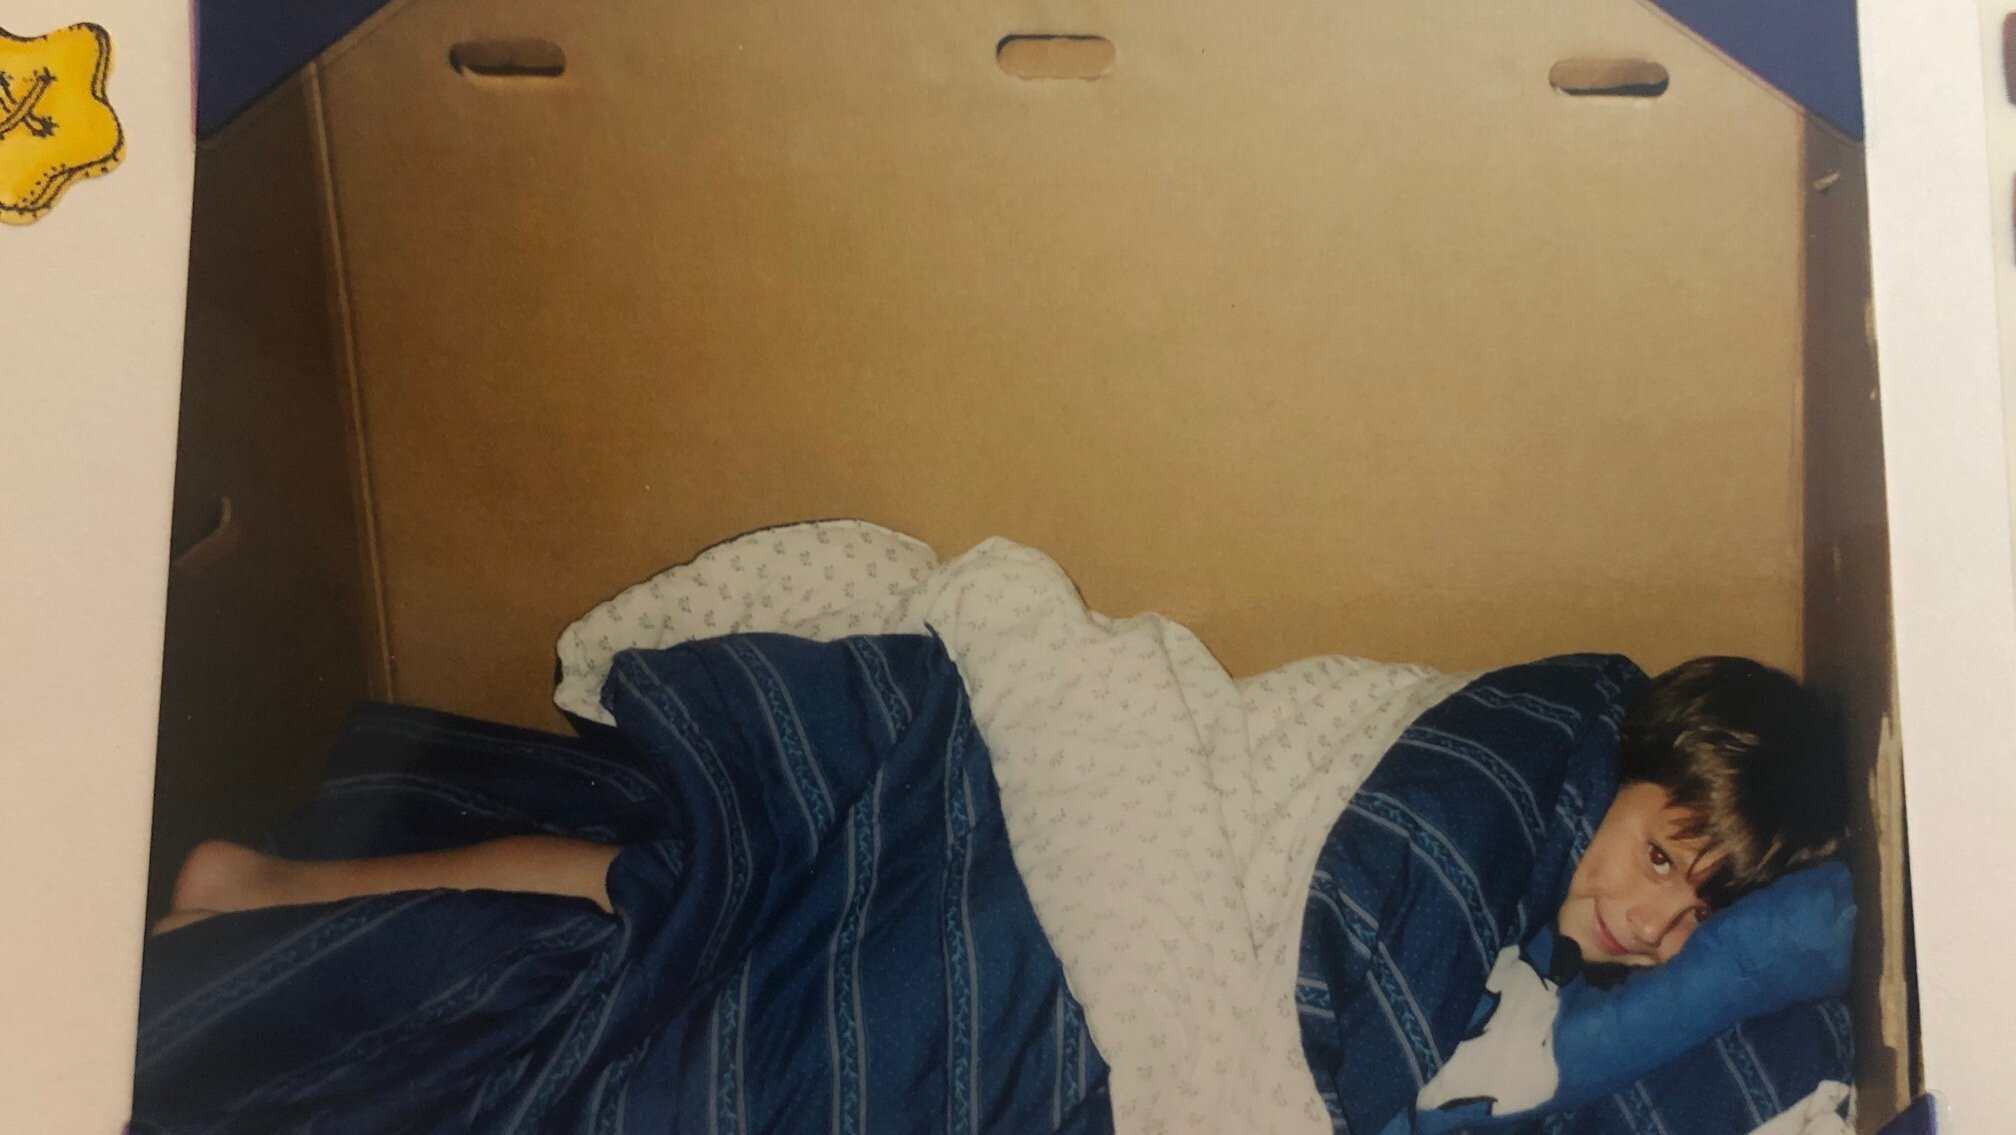 Chandler sleeping in box.jpg